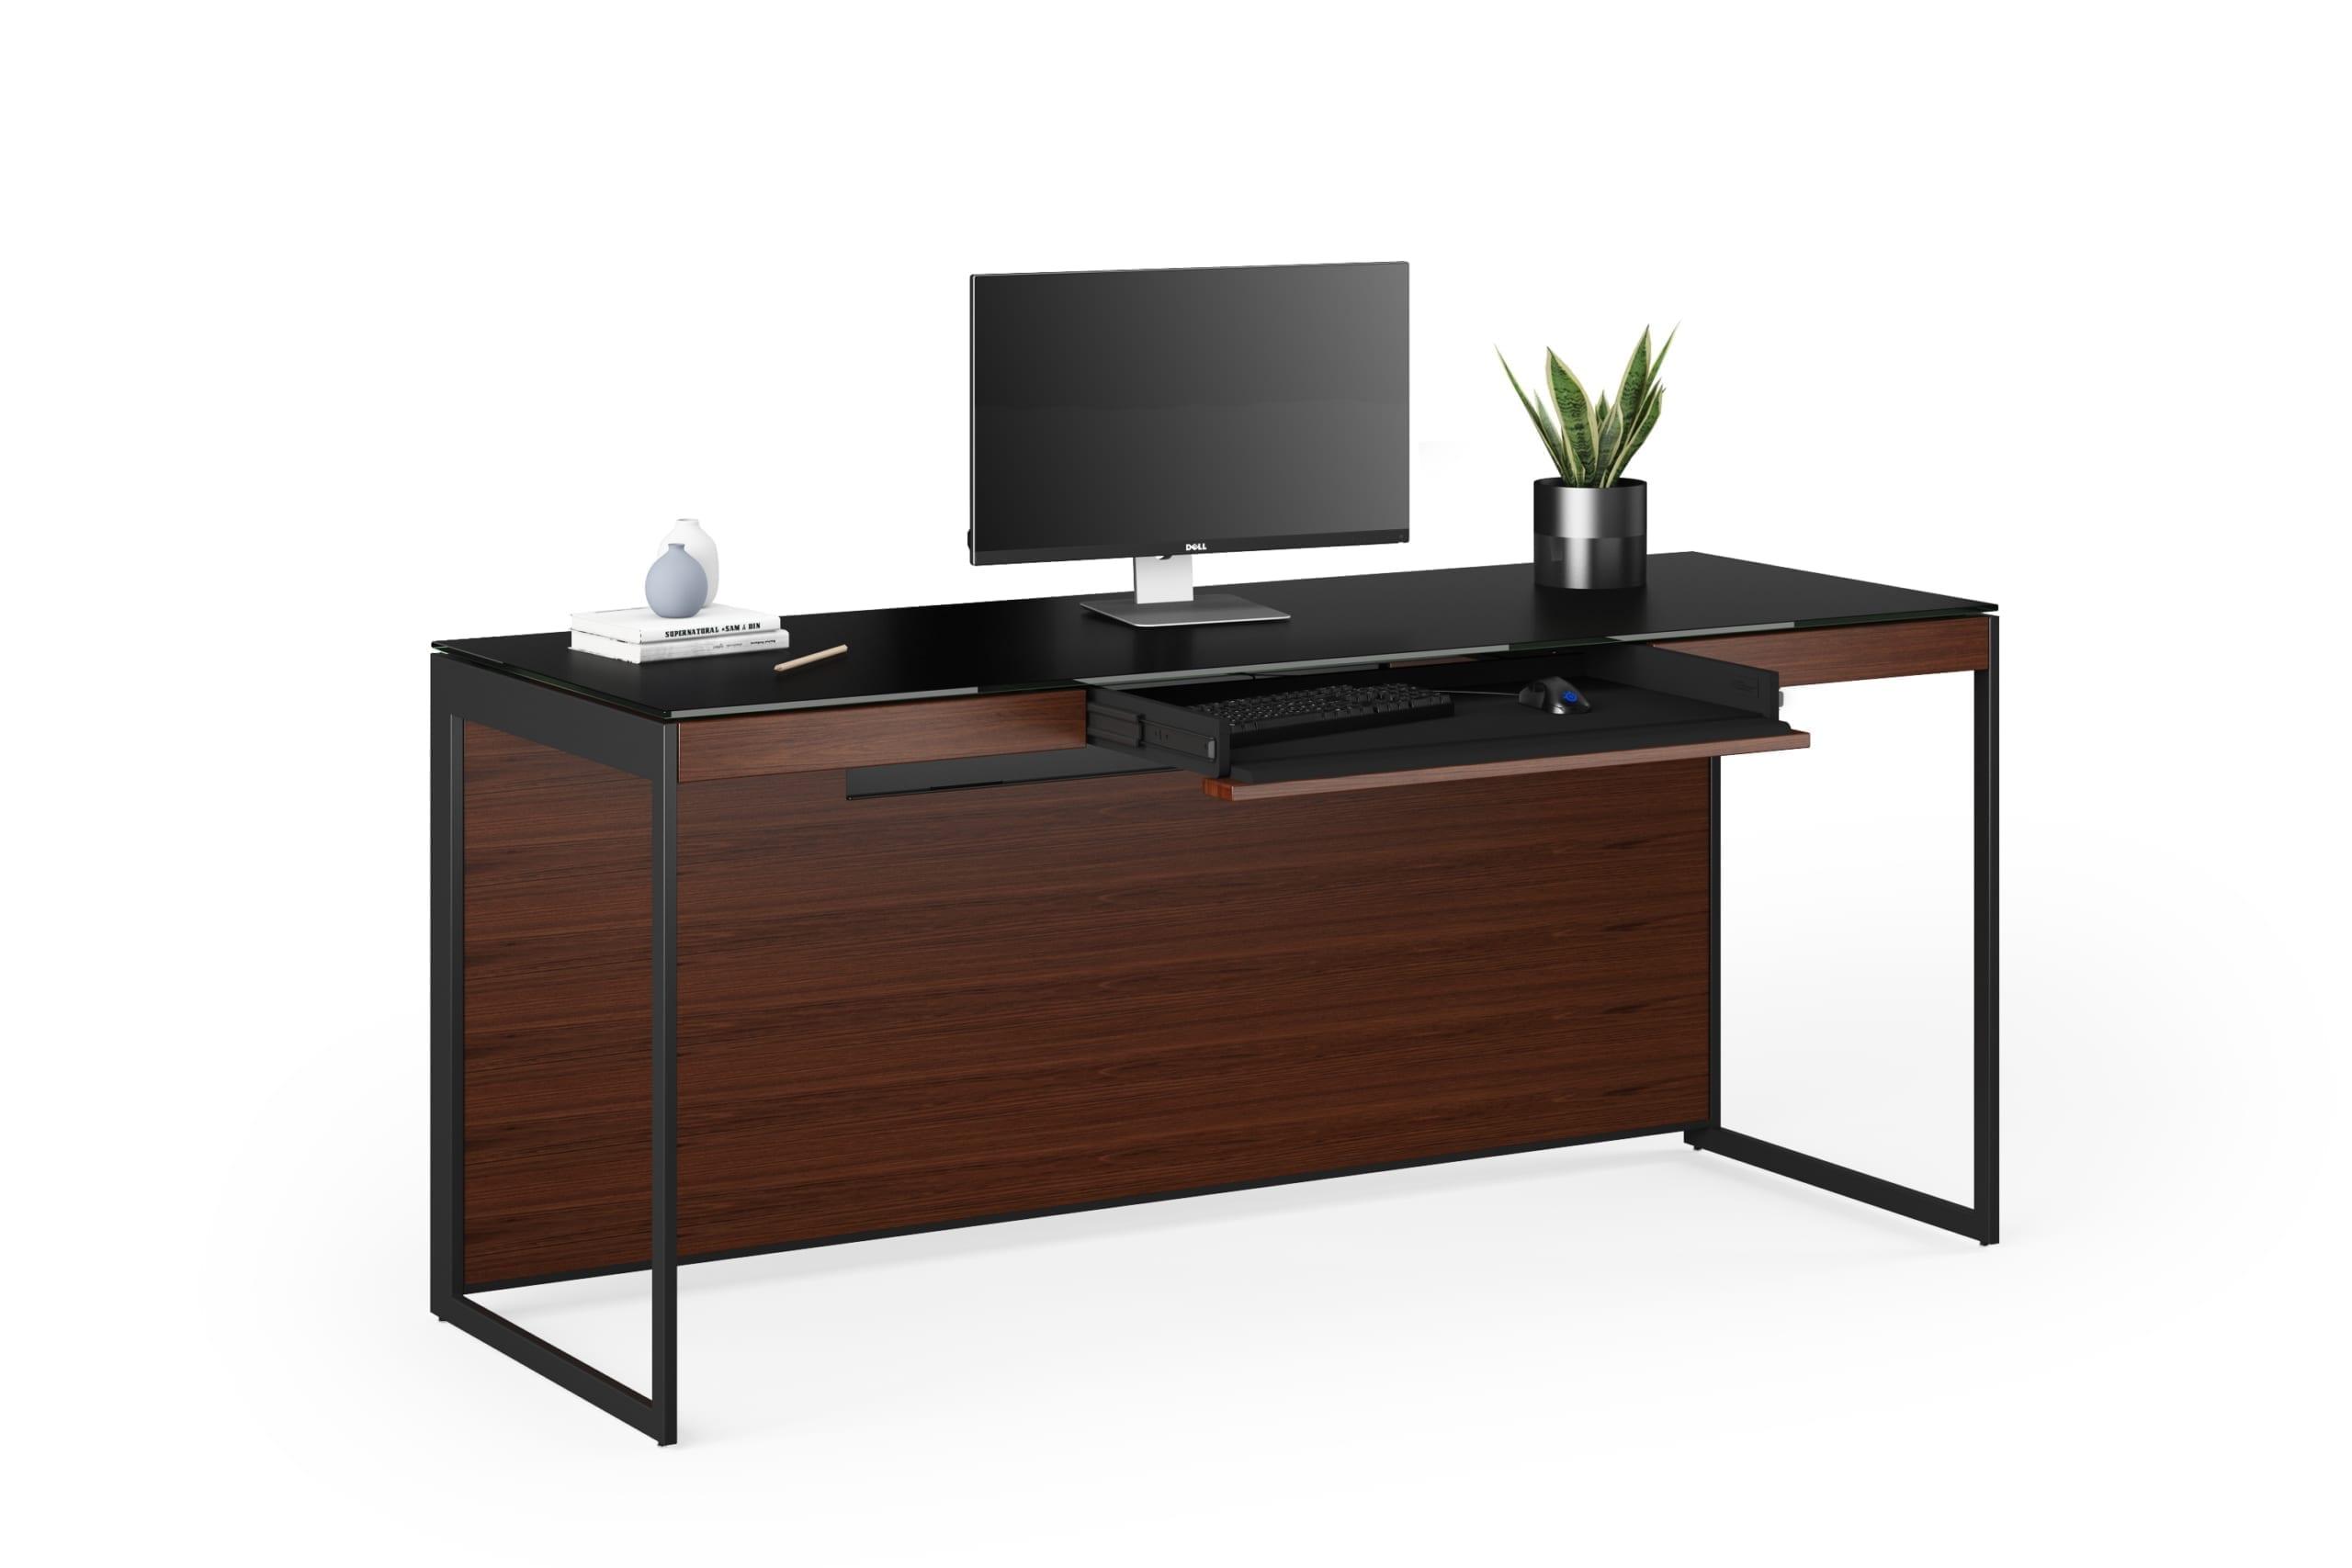 Sequel 20 6101 Desk Black / Chocolate Walnut 1